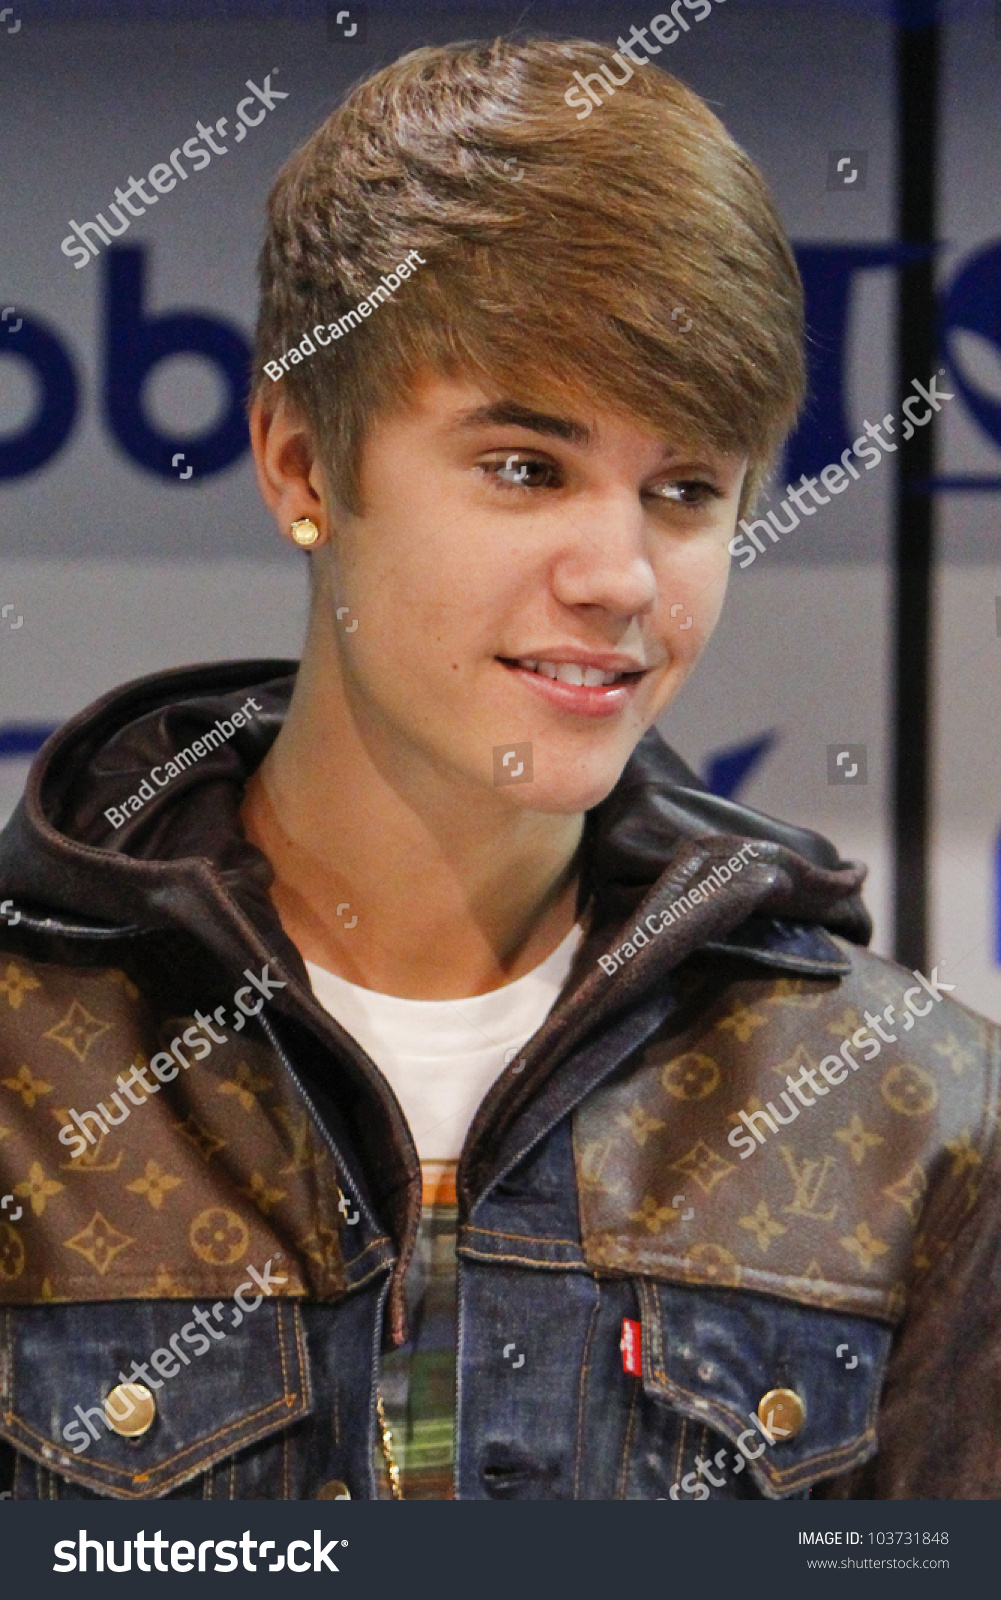 Justin Bieber Premiere Sneak Peek - YouTube